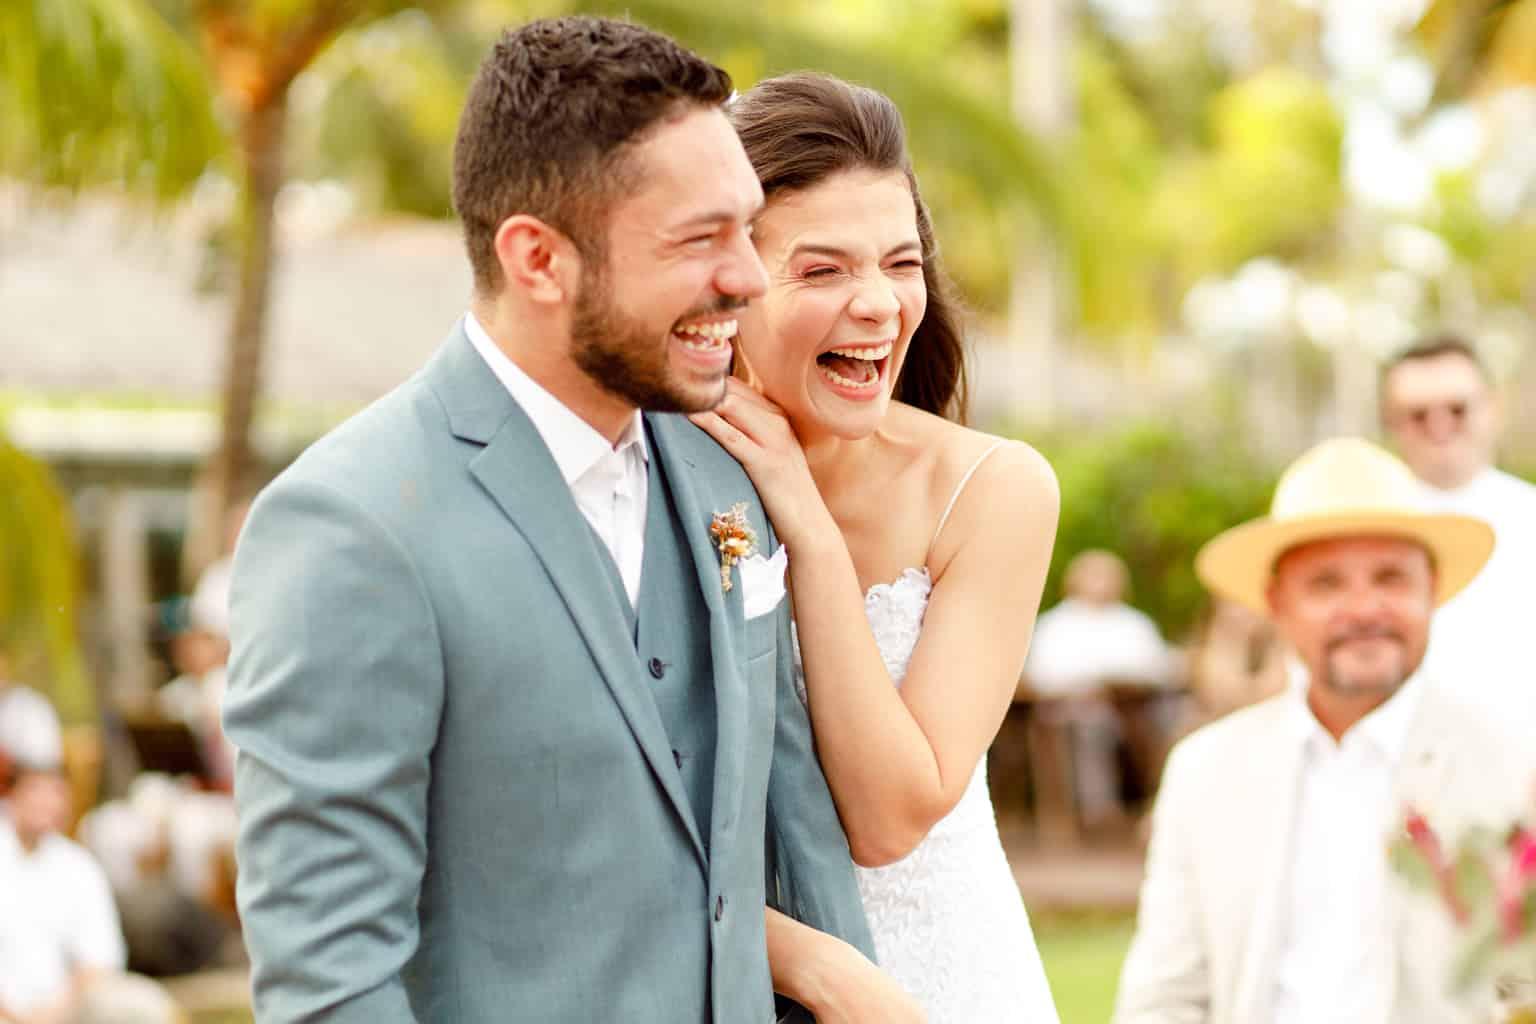 Casamento-Emanuelle-e-Alysson-Fotografia-Tadeu-Nanó-e-Luca-Antunes97-1